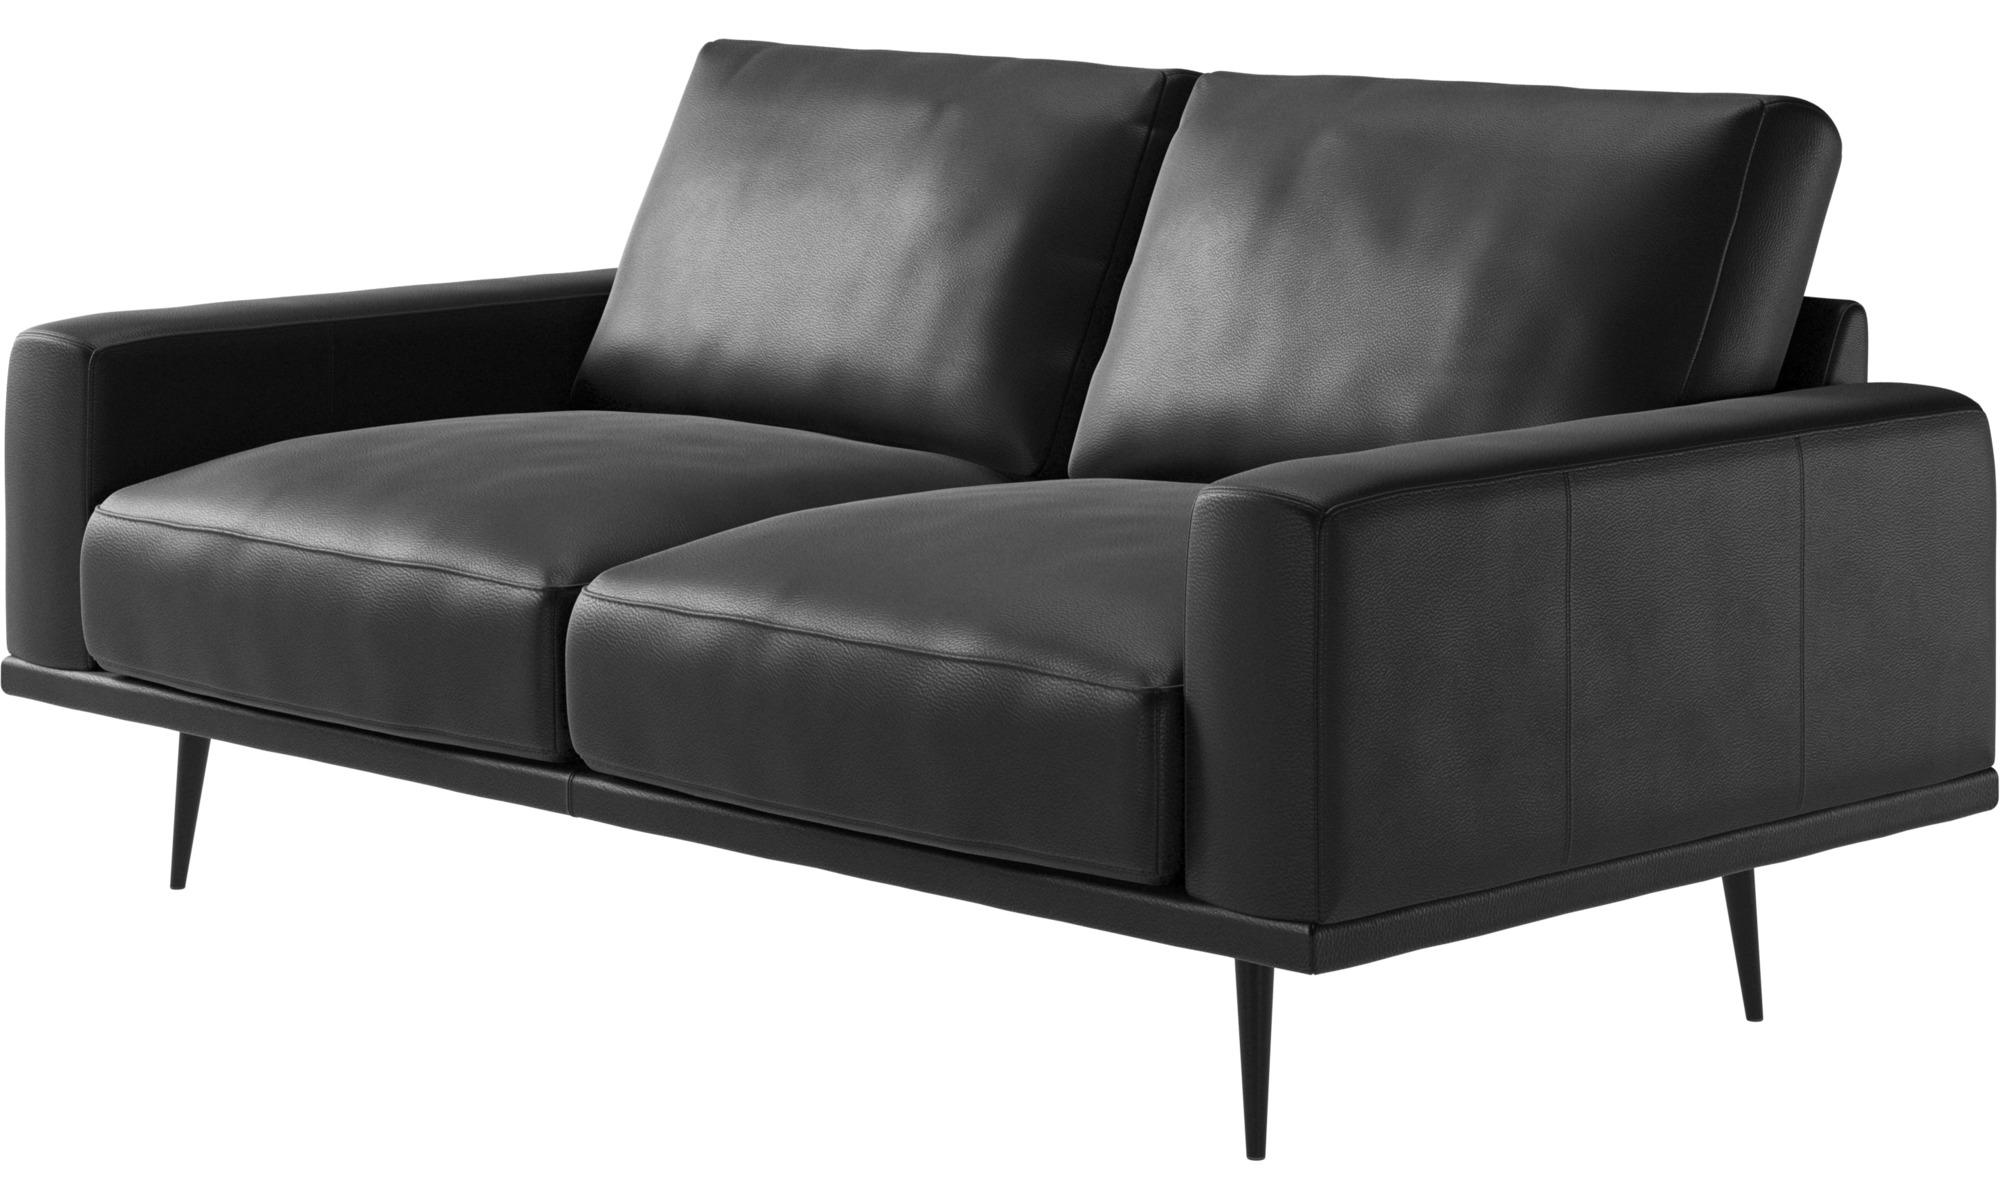 2 Seater Sofas Carlton Sofa Boconcept